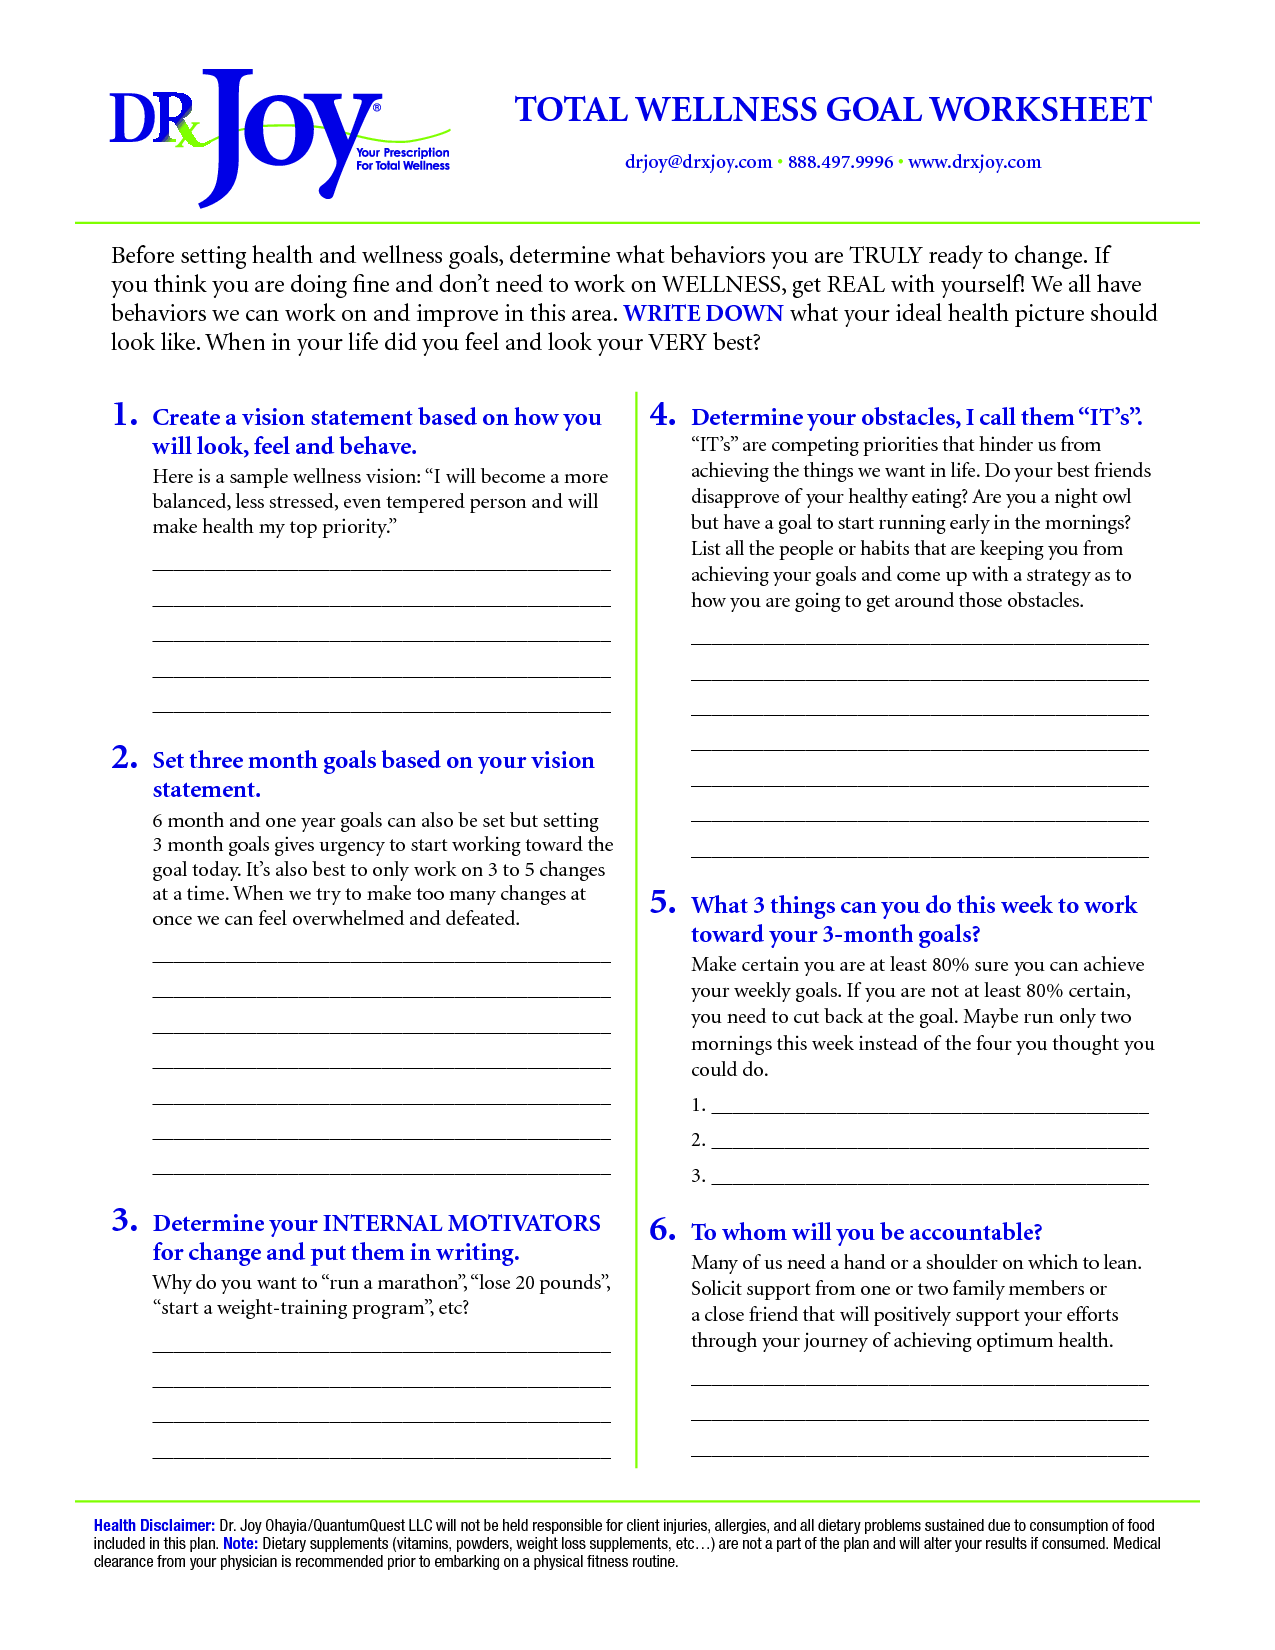 Free Total Wellness Goal Sheet